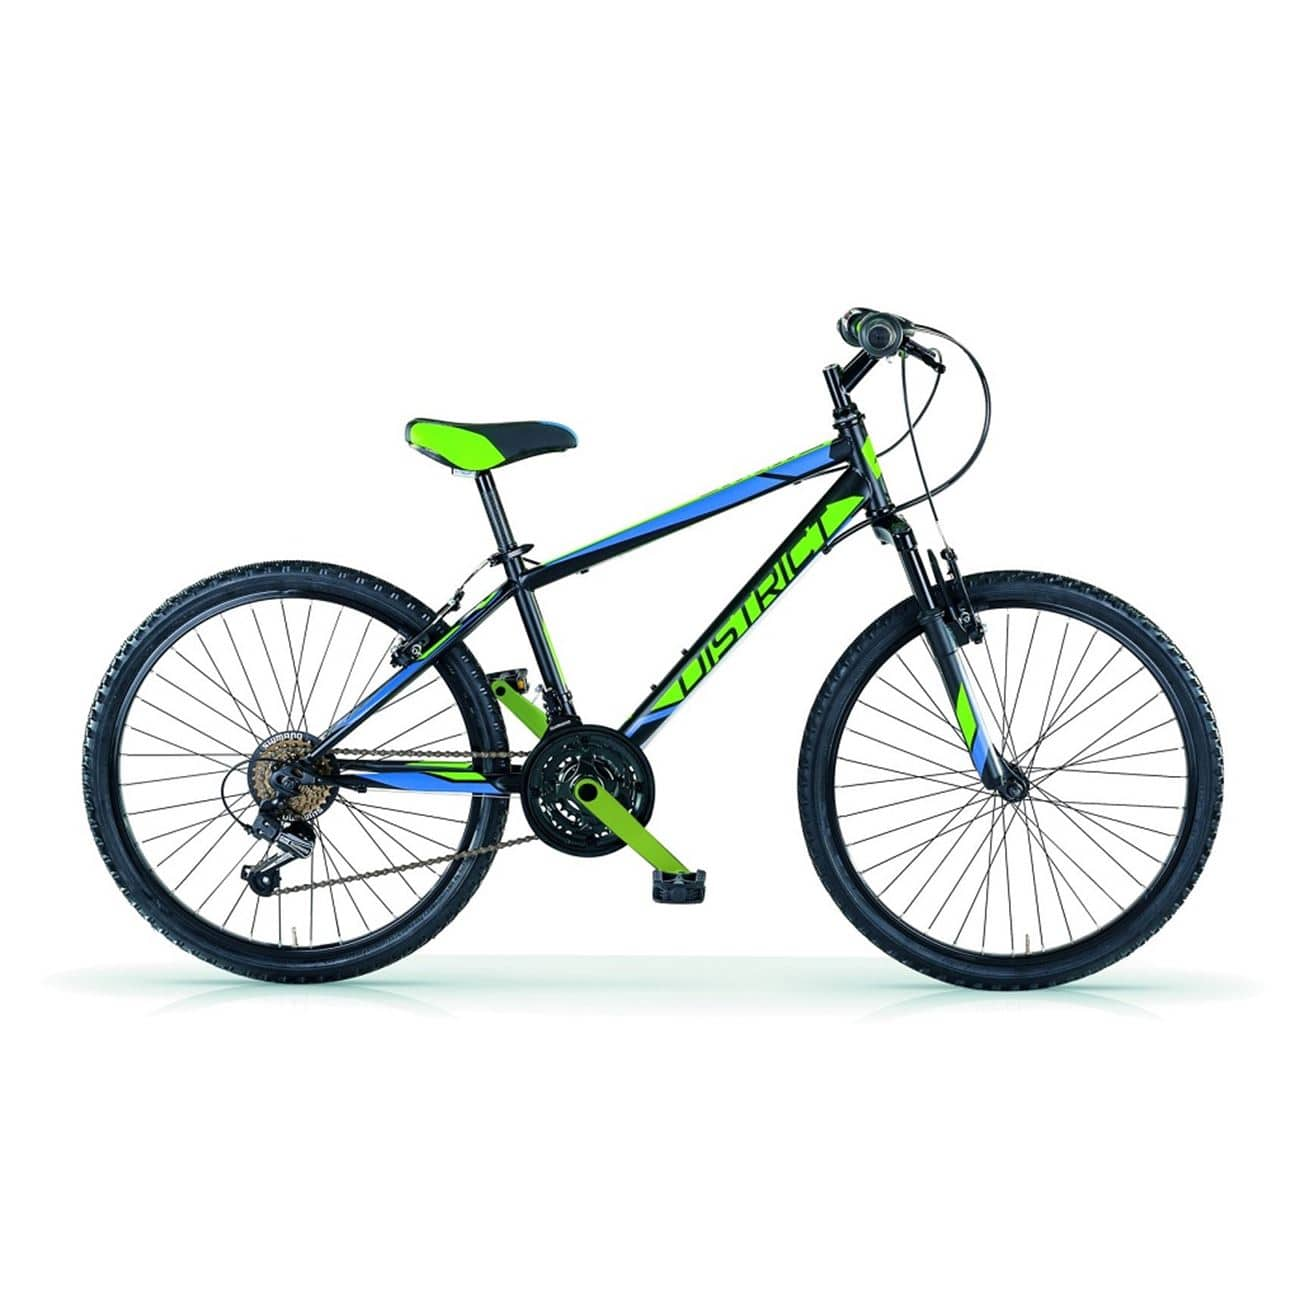 "Mbm Ποδήλατο District Mtb 20"" Παιδικό"